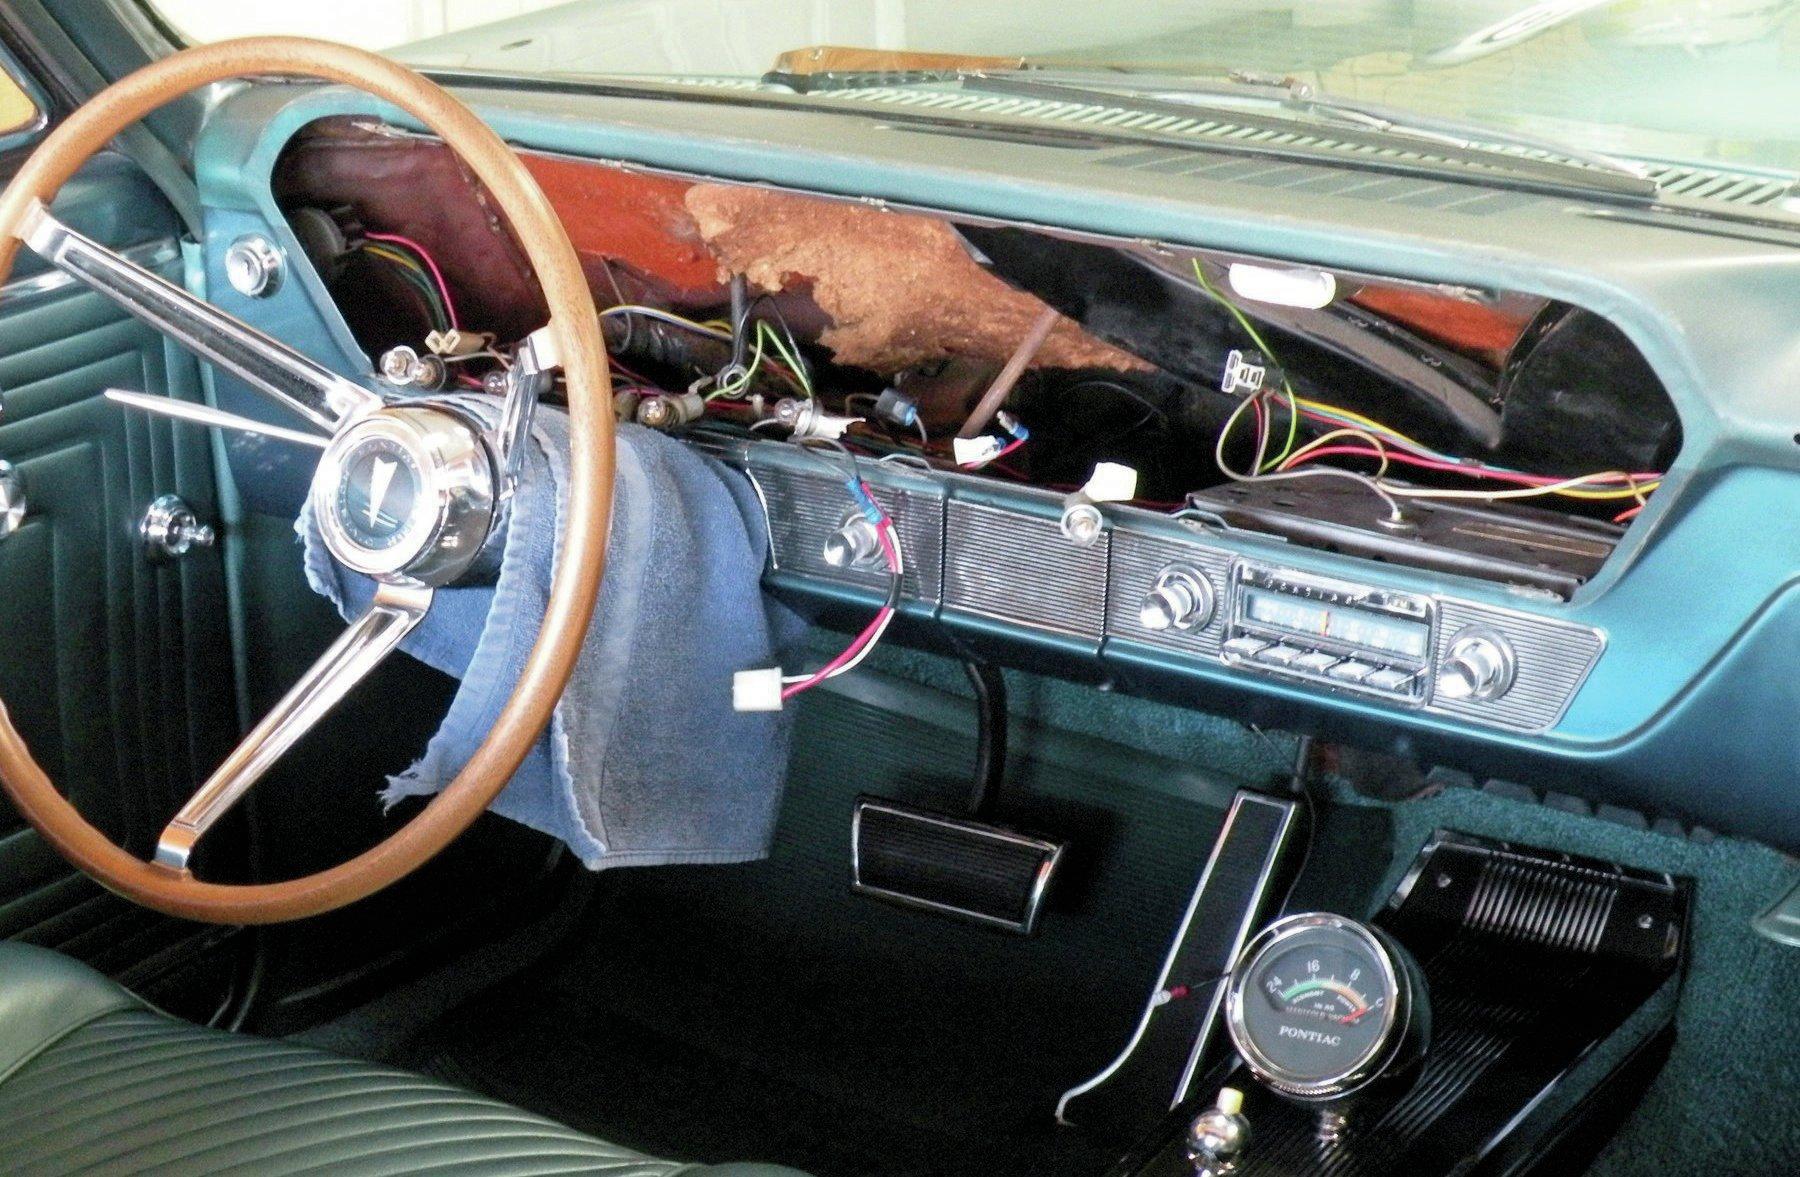 1967 gto rally gauge wiring diagram wiring library 1965 gto dash wiring diagram [ 1800 x 1177 Pixel ]